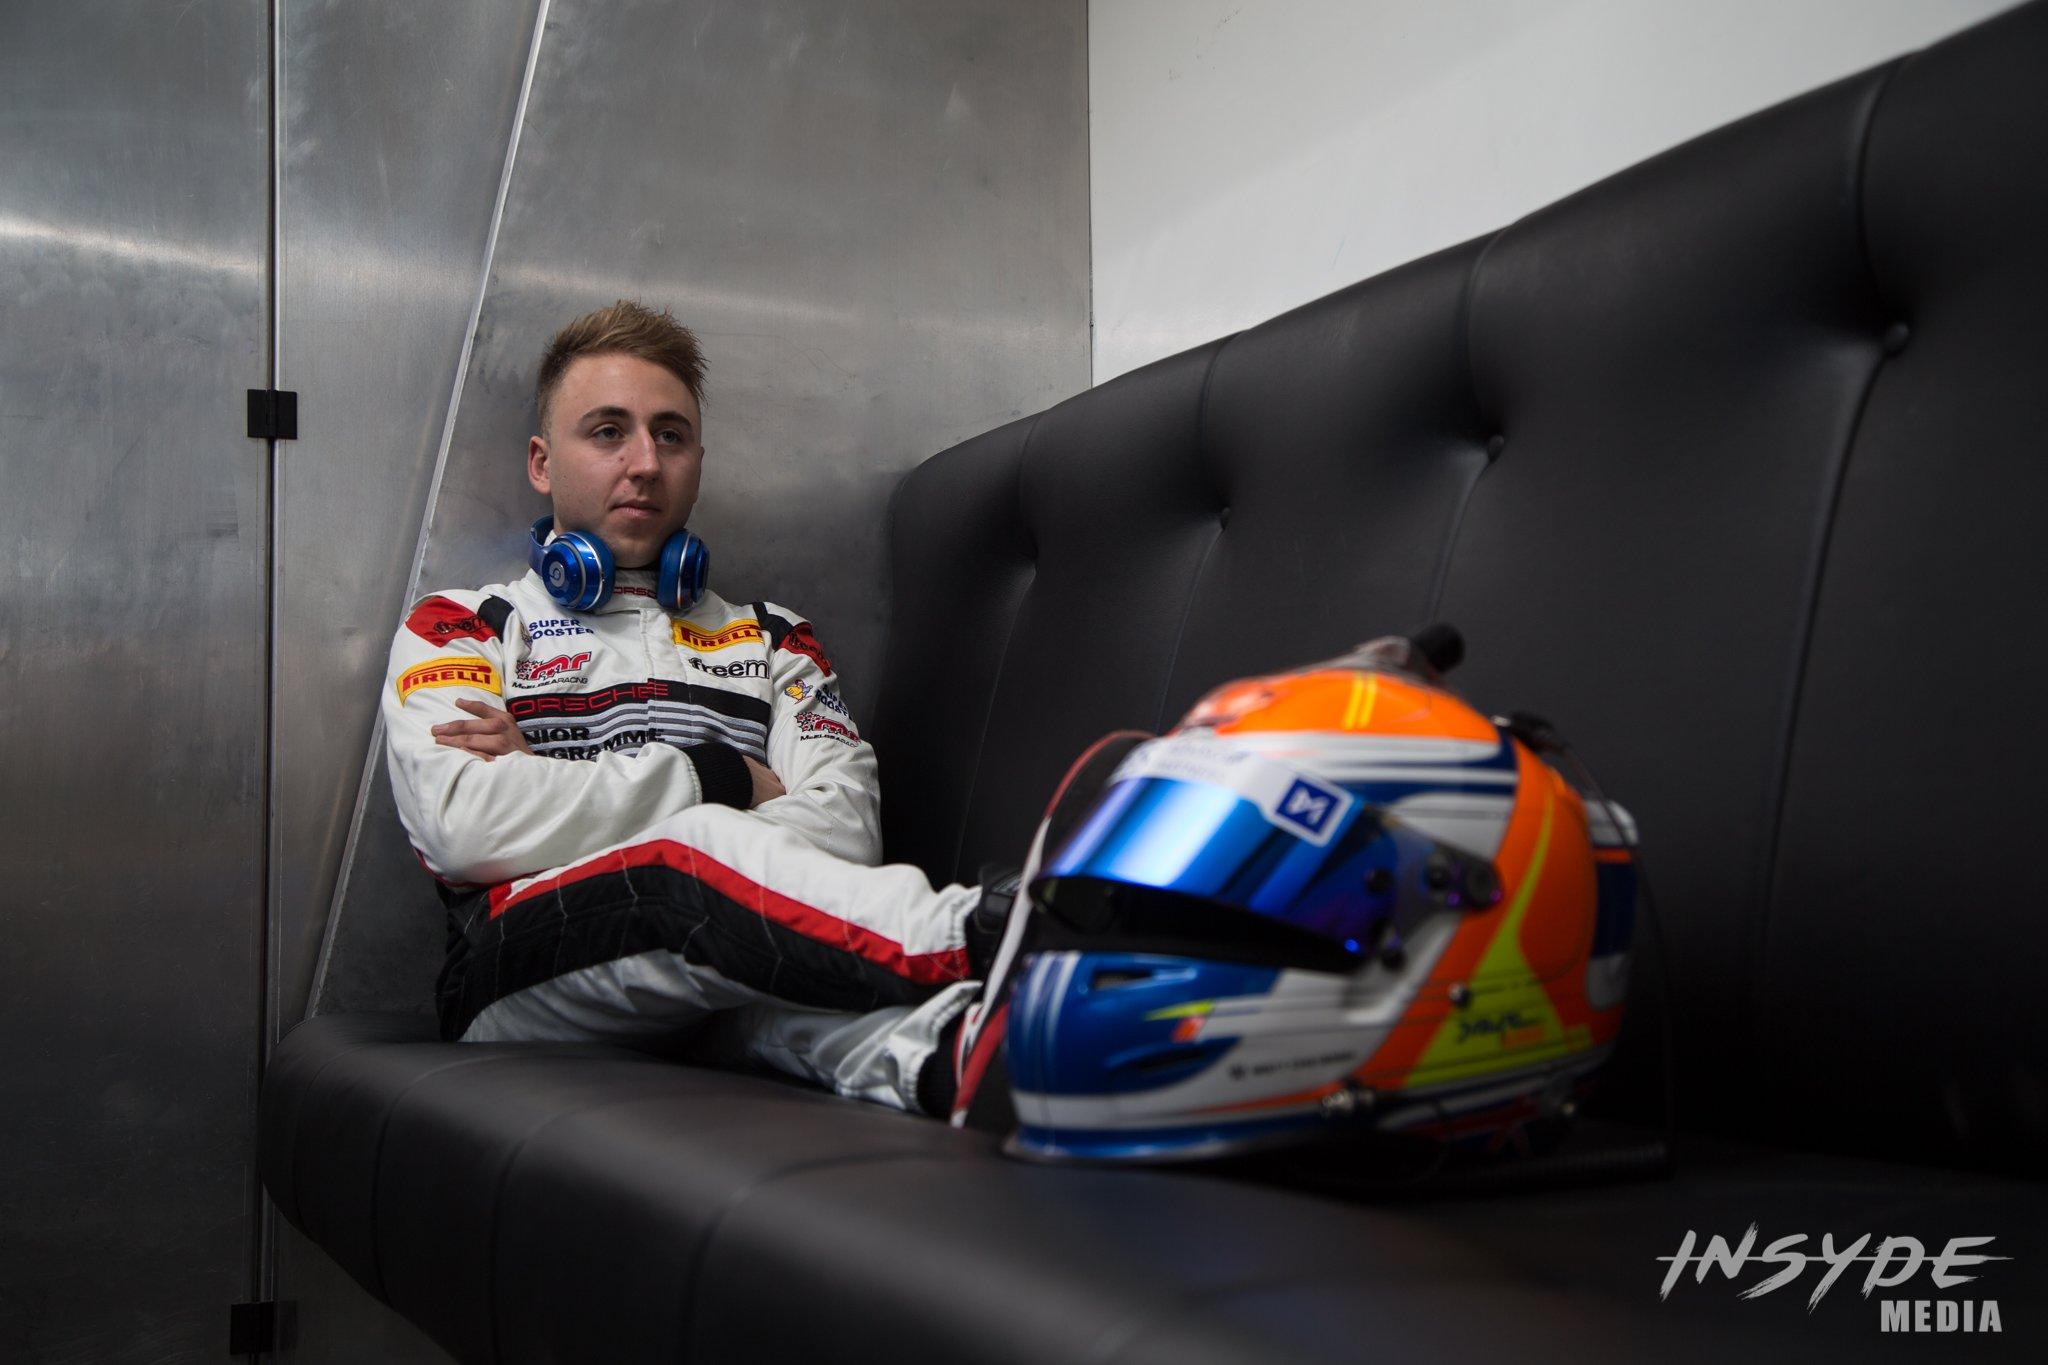 Motorsport-Events-InSydeMedia-018